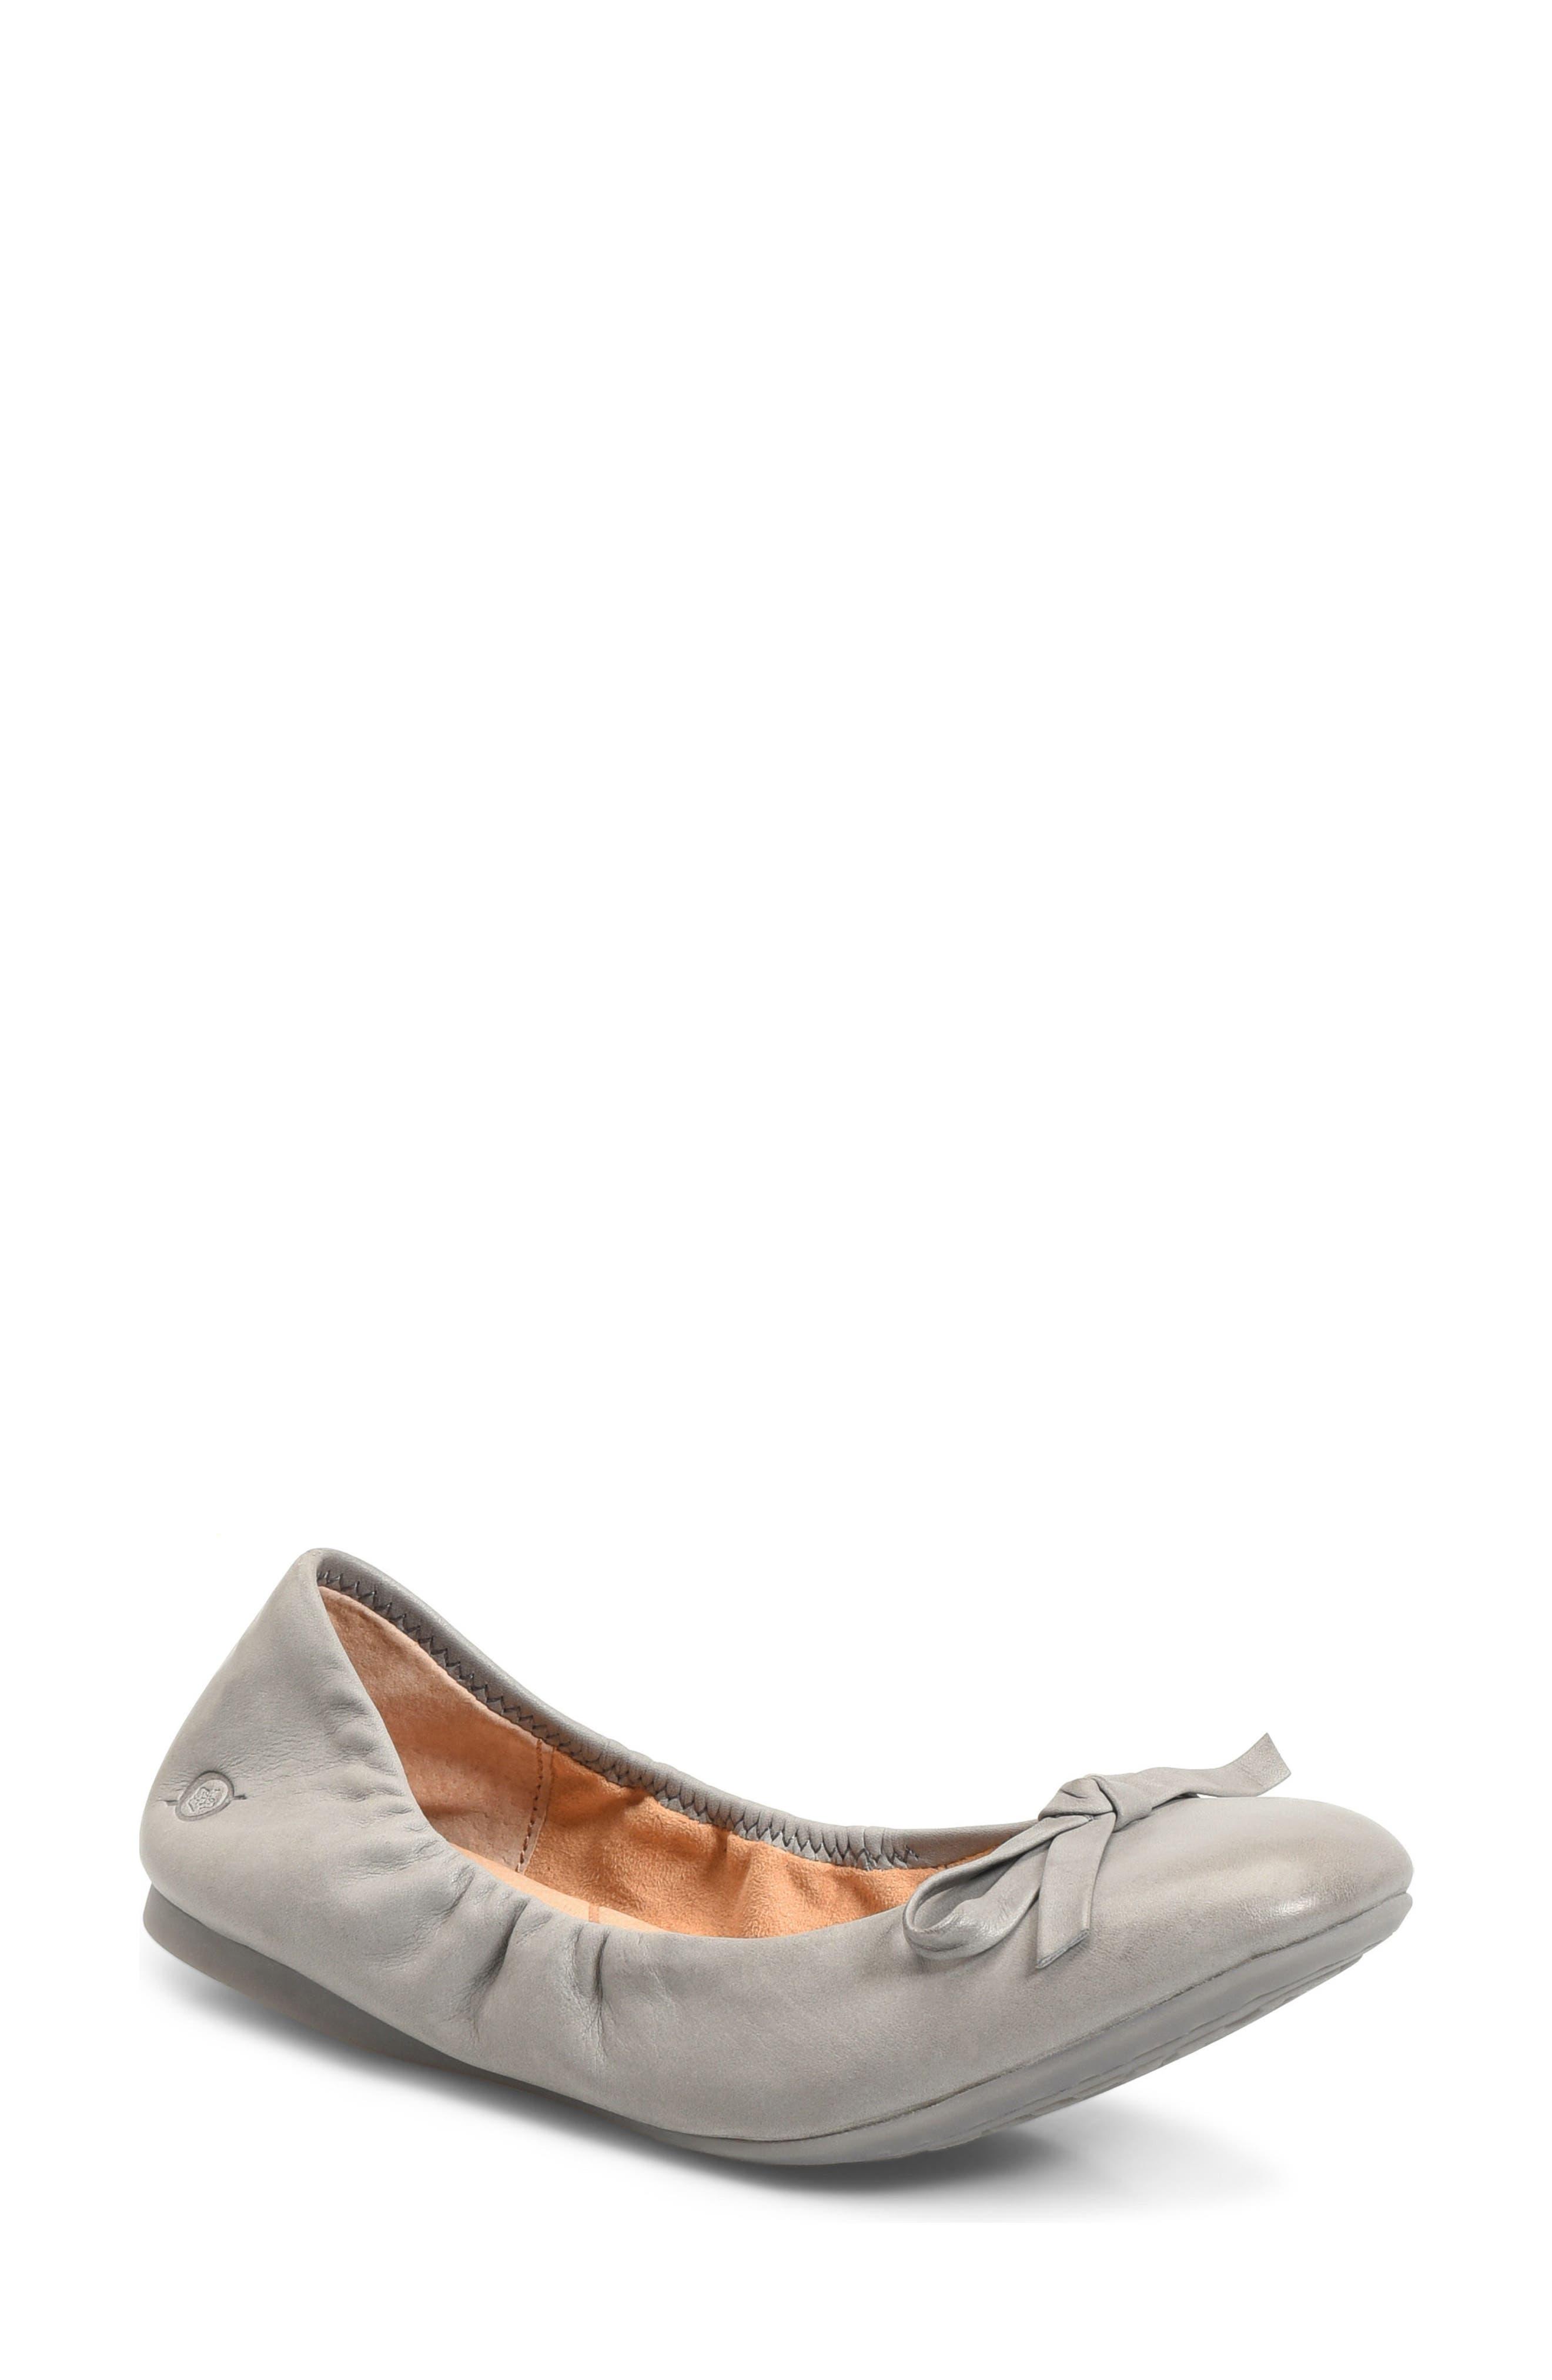 Karoline Ballet Flat,                             Main thumbnail 1, color,                             Grey Leather